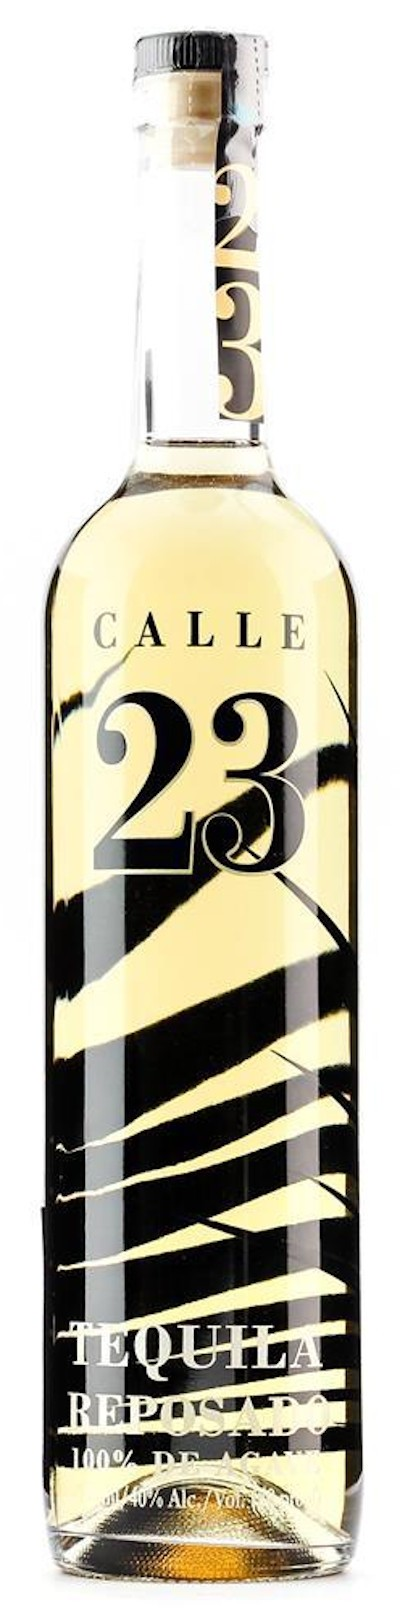 Calle 23 - Tequila Reposado